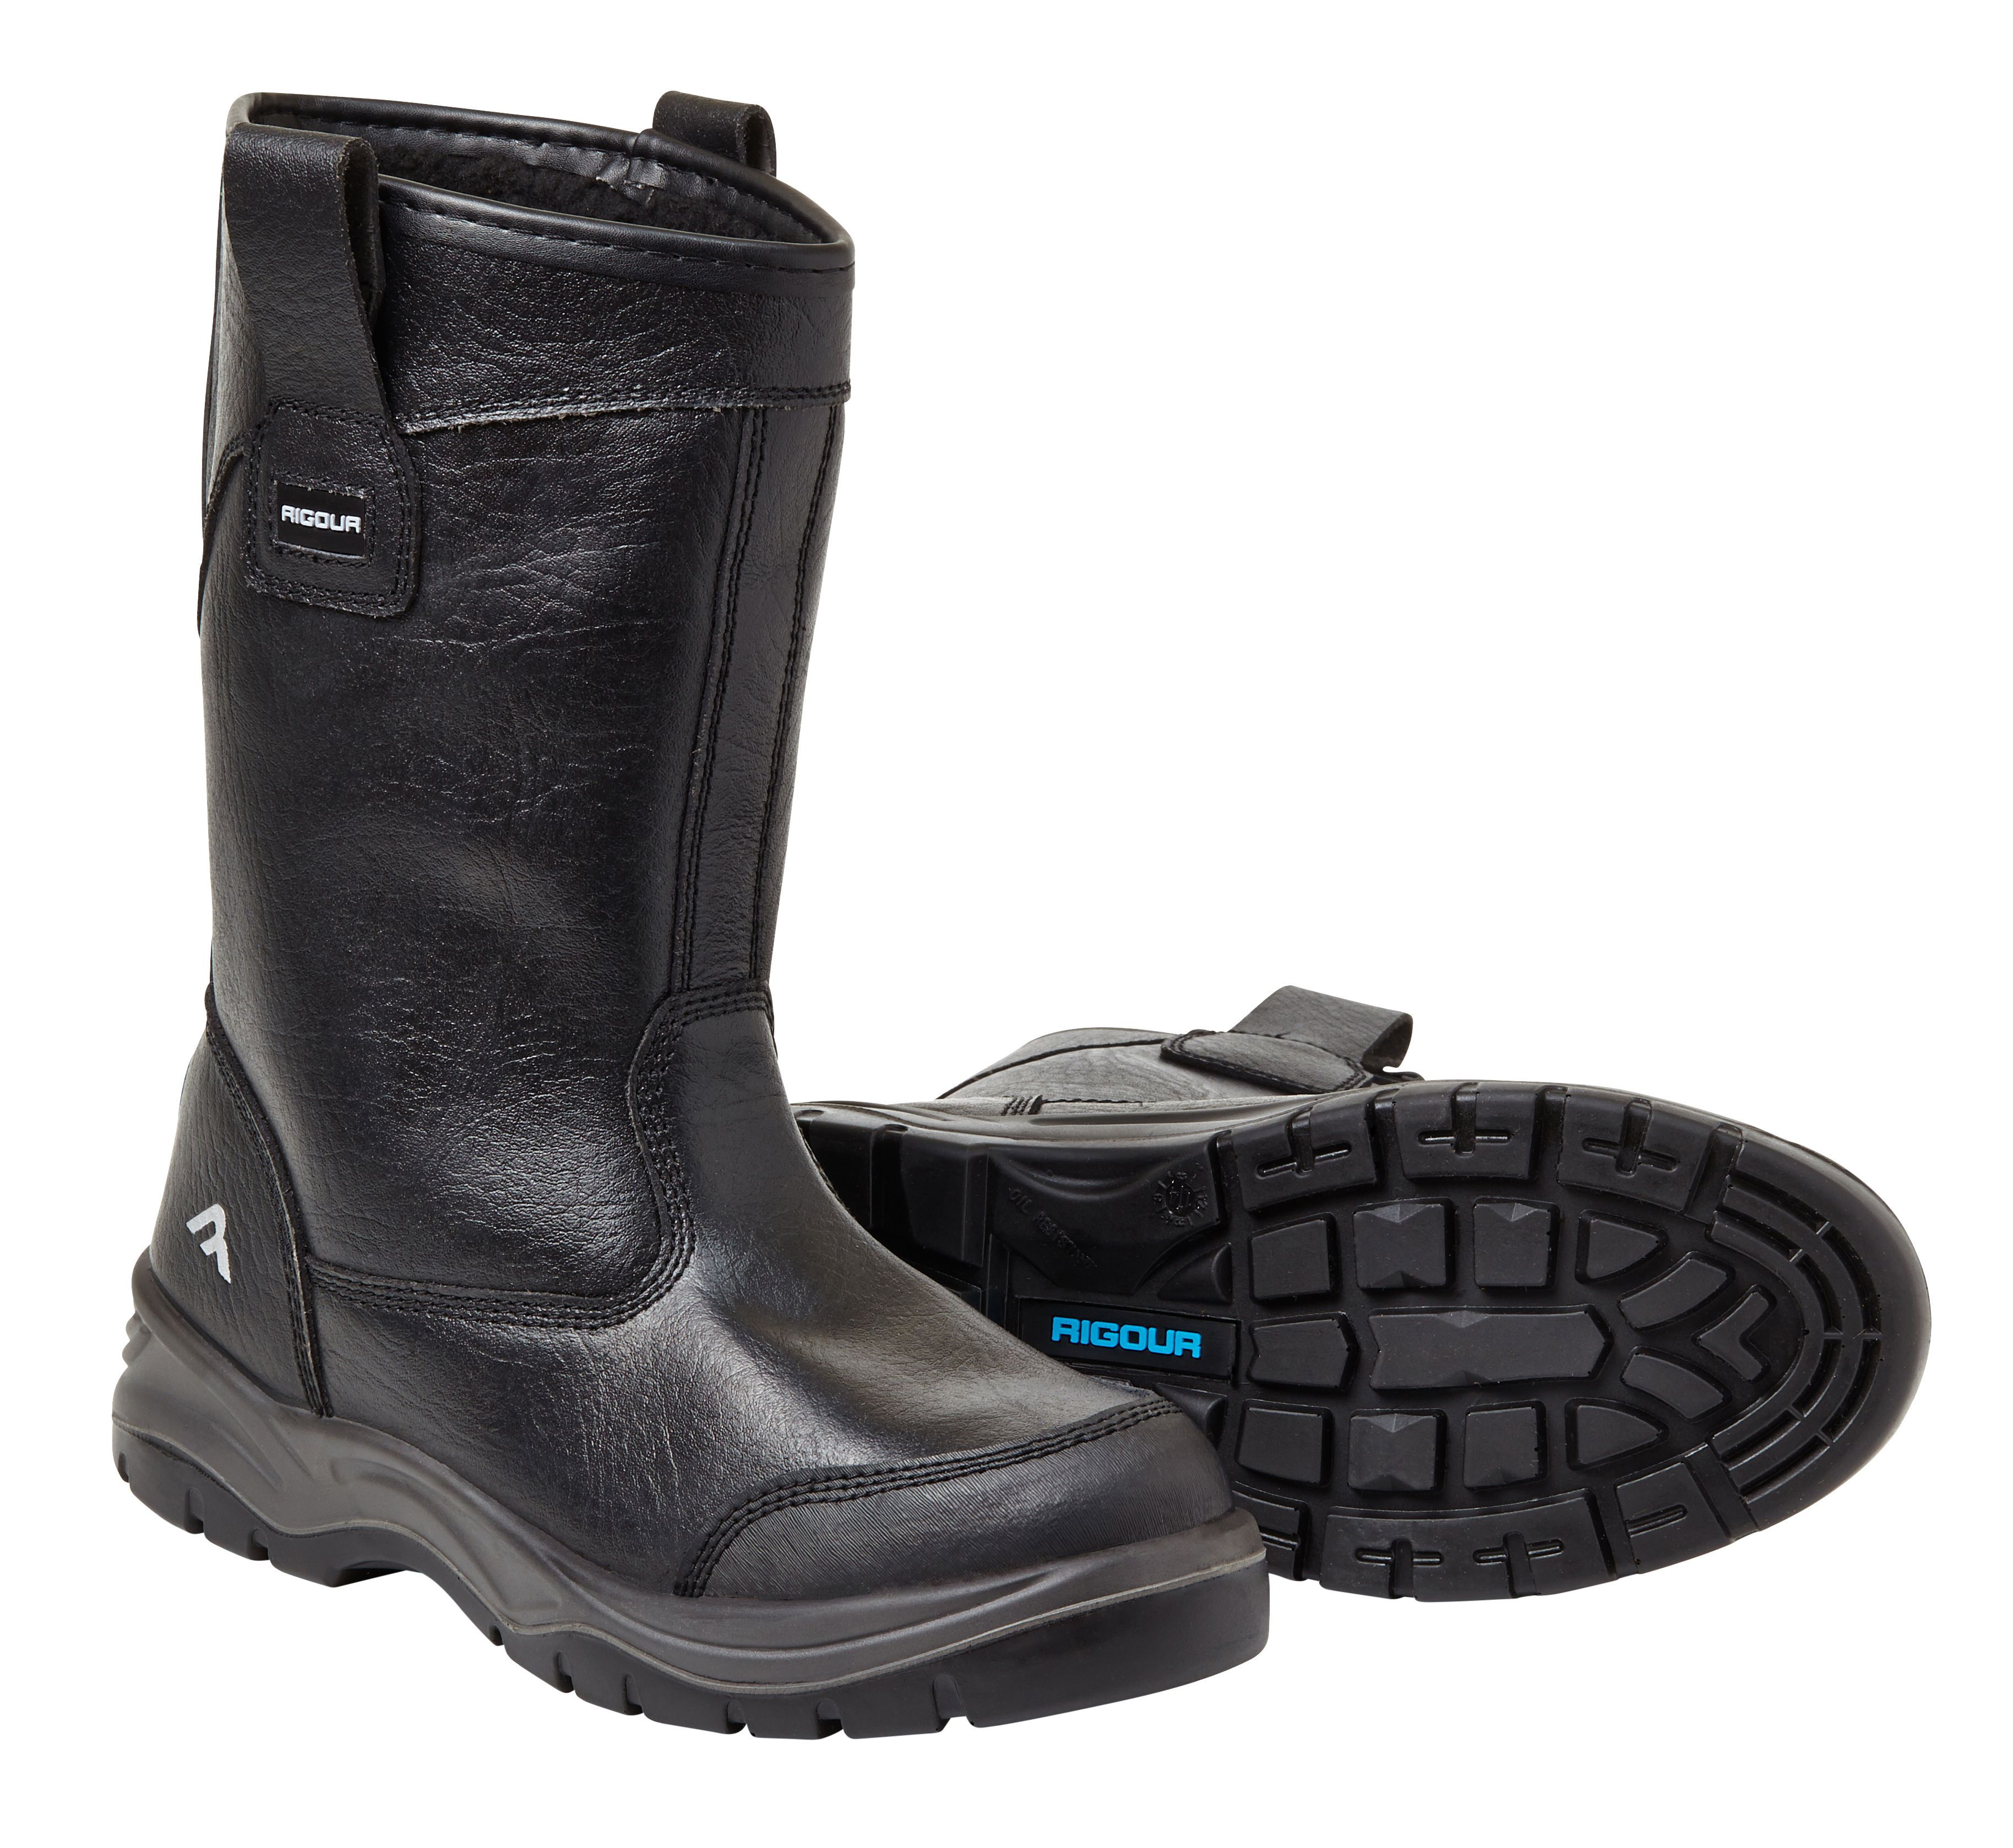 Rigour Black Rigger Boots, Size 7